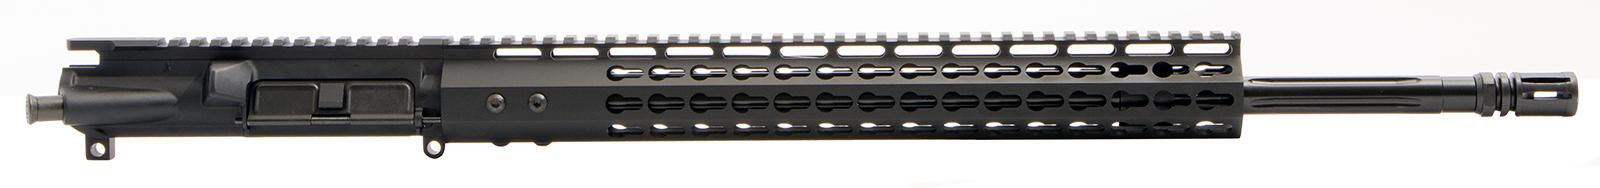 ar-15-upper-assembly-20-223-5-56-straight-flute-15-cbc-gen-2-keymod-ar-15-handguard-rail